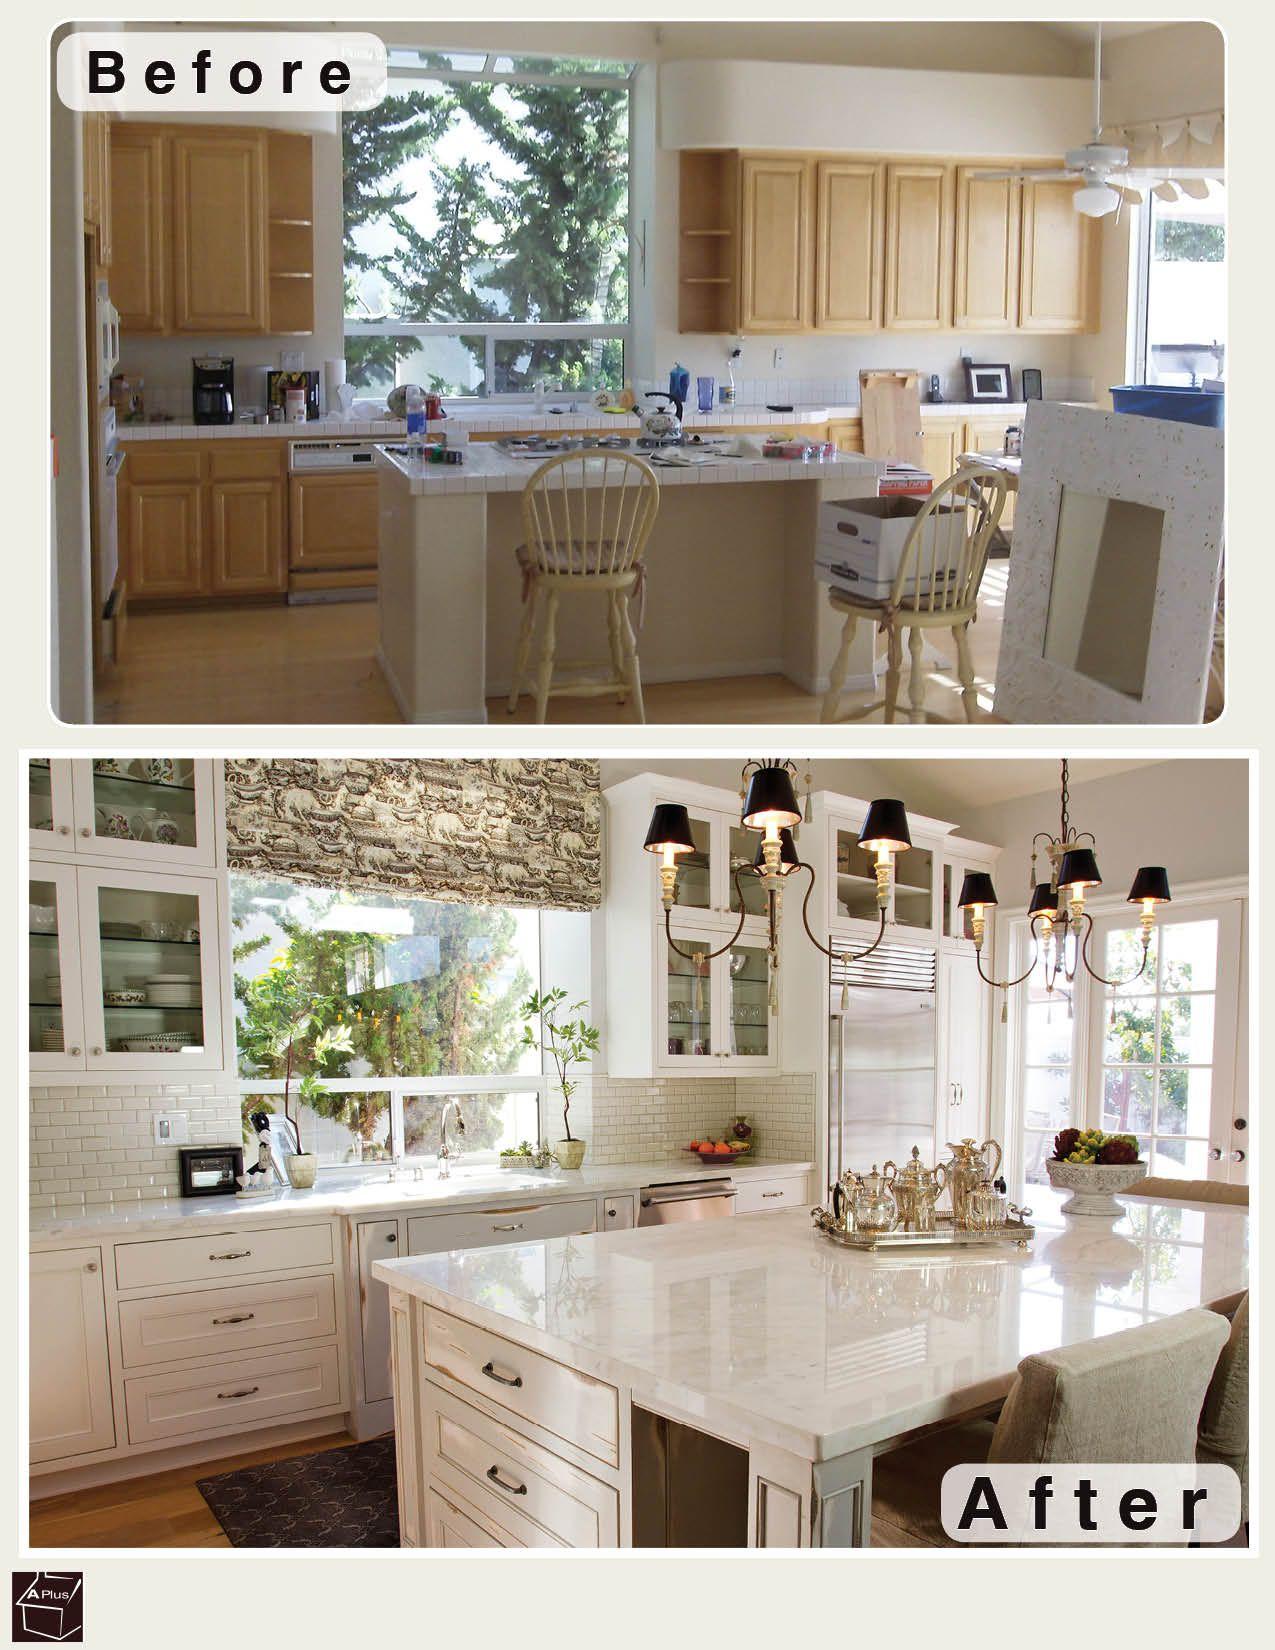 beautiful kitchen remodel image k che kitchen pinterest beautiful k che vorher. Black Bedroom Furniture Sets. Home Design Ideas